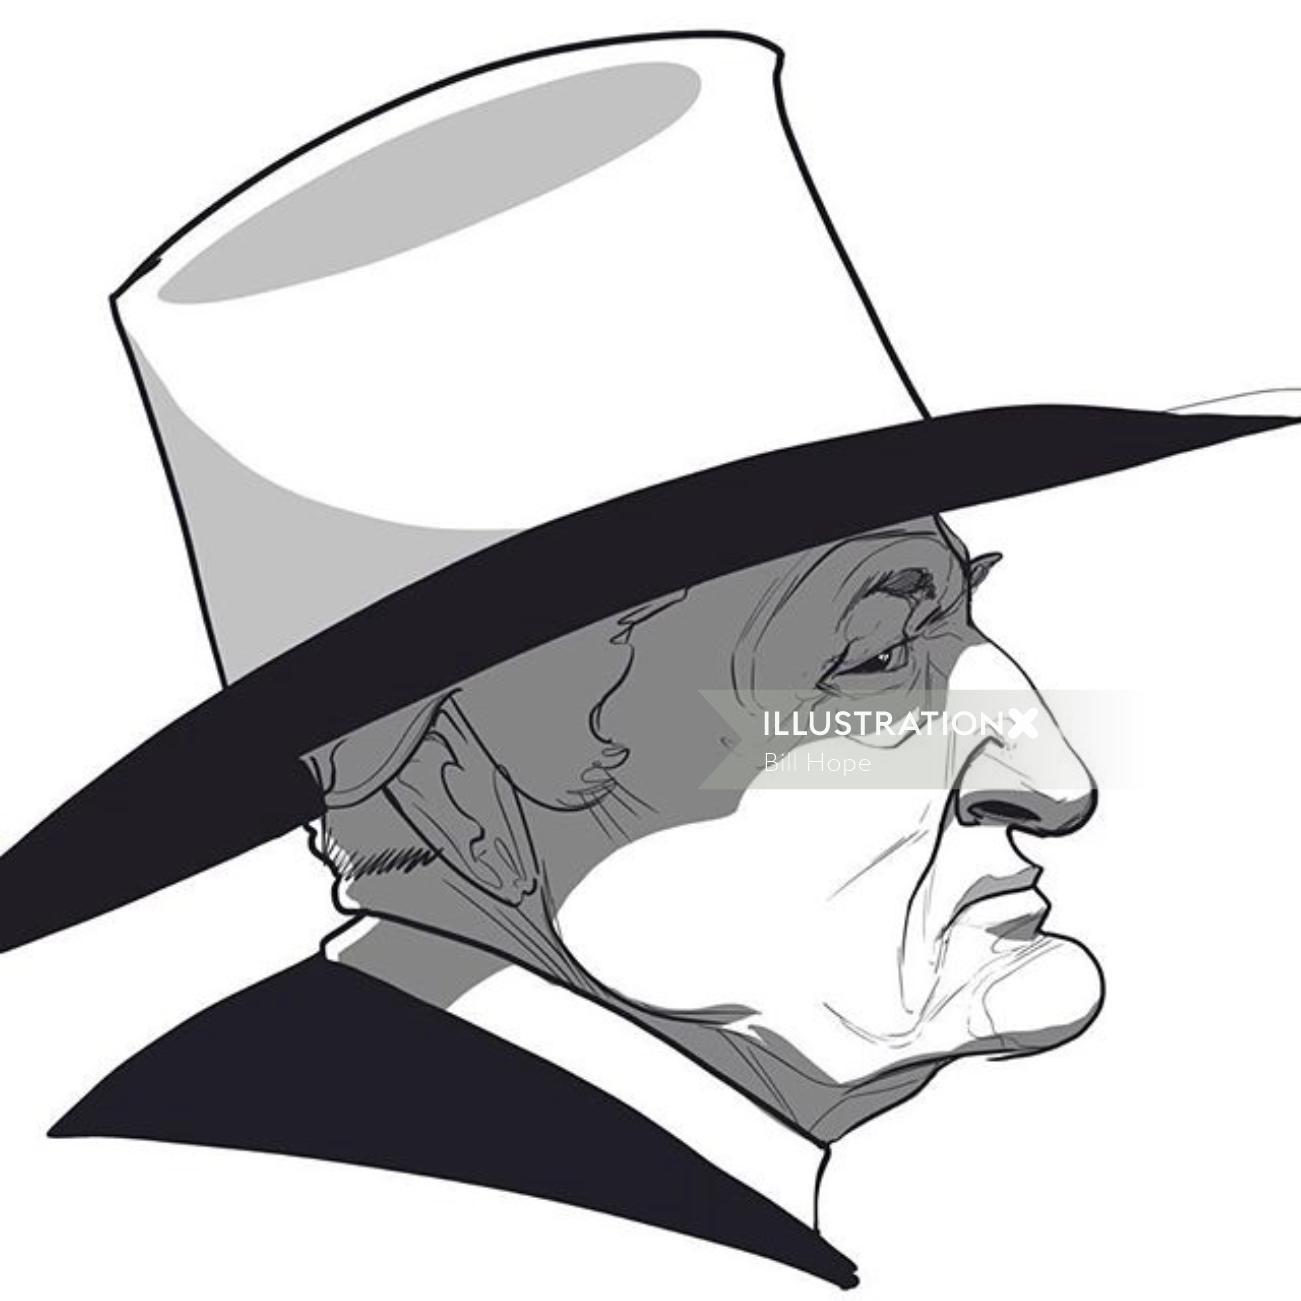 Caricature of Bob Katter